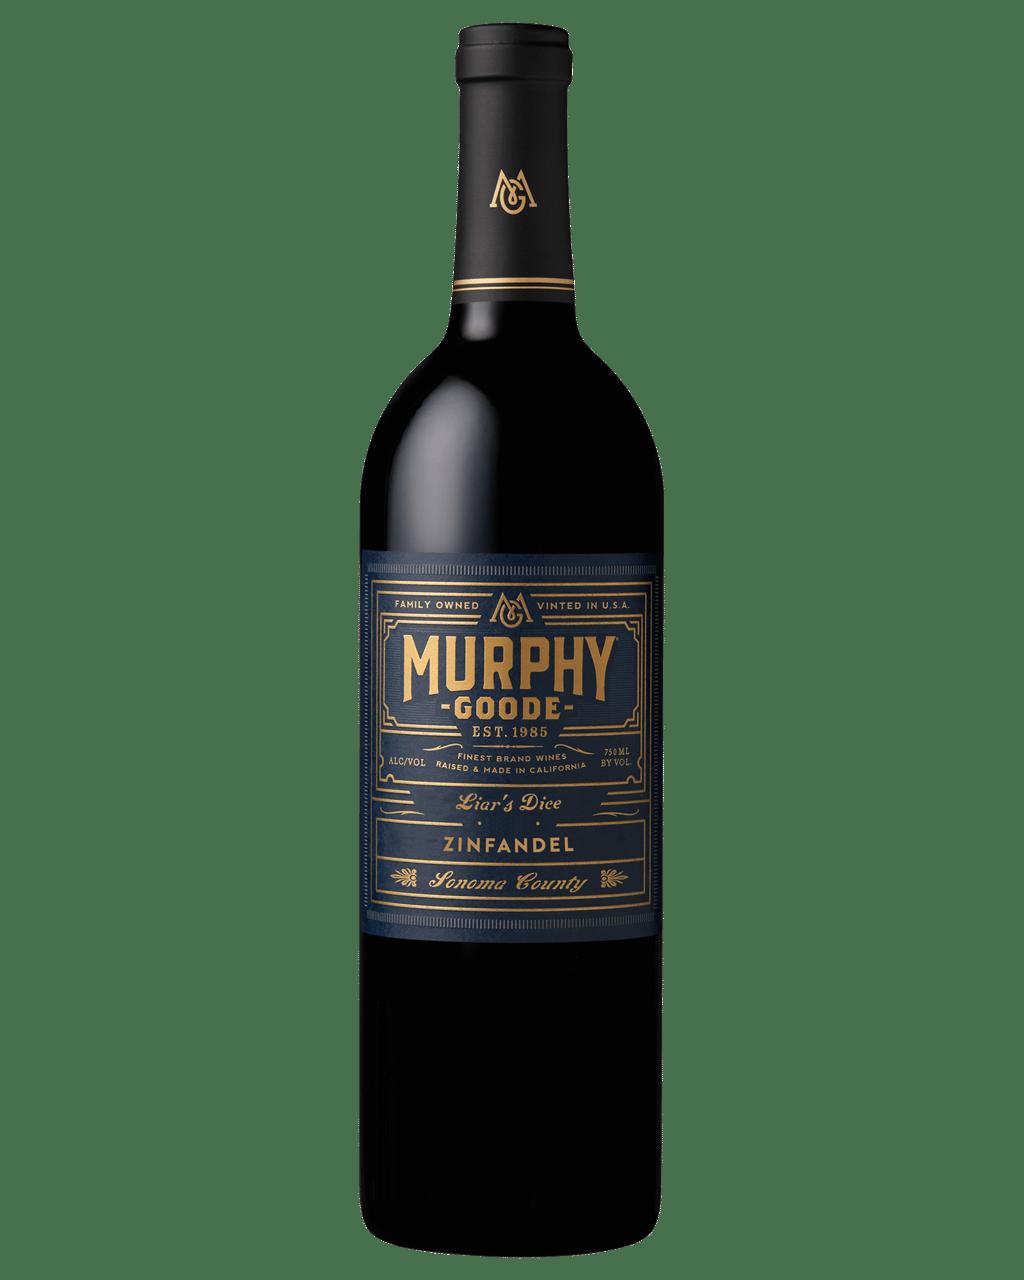 6b6547e7e0 Murphy-Goode Liar's Dice Zinfandel